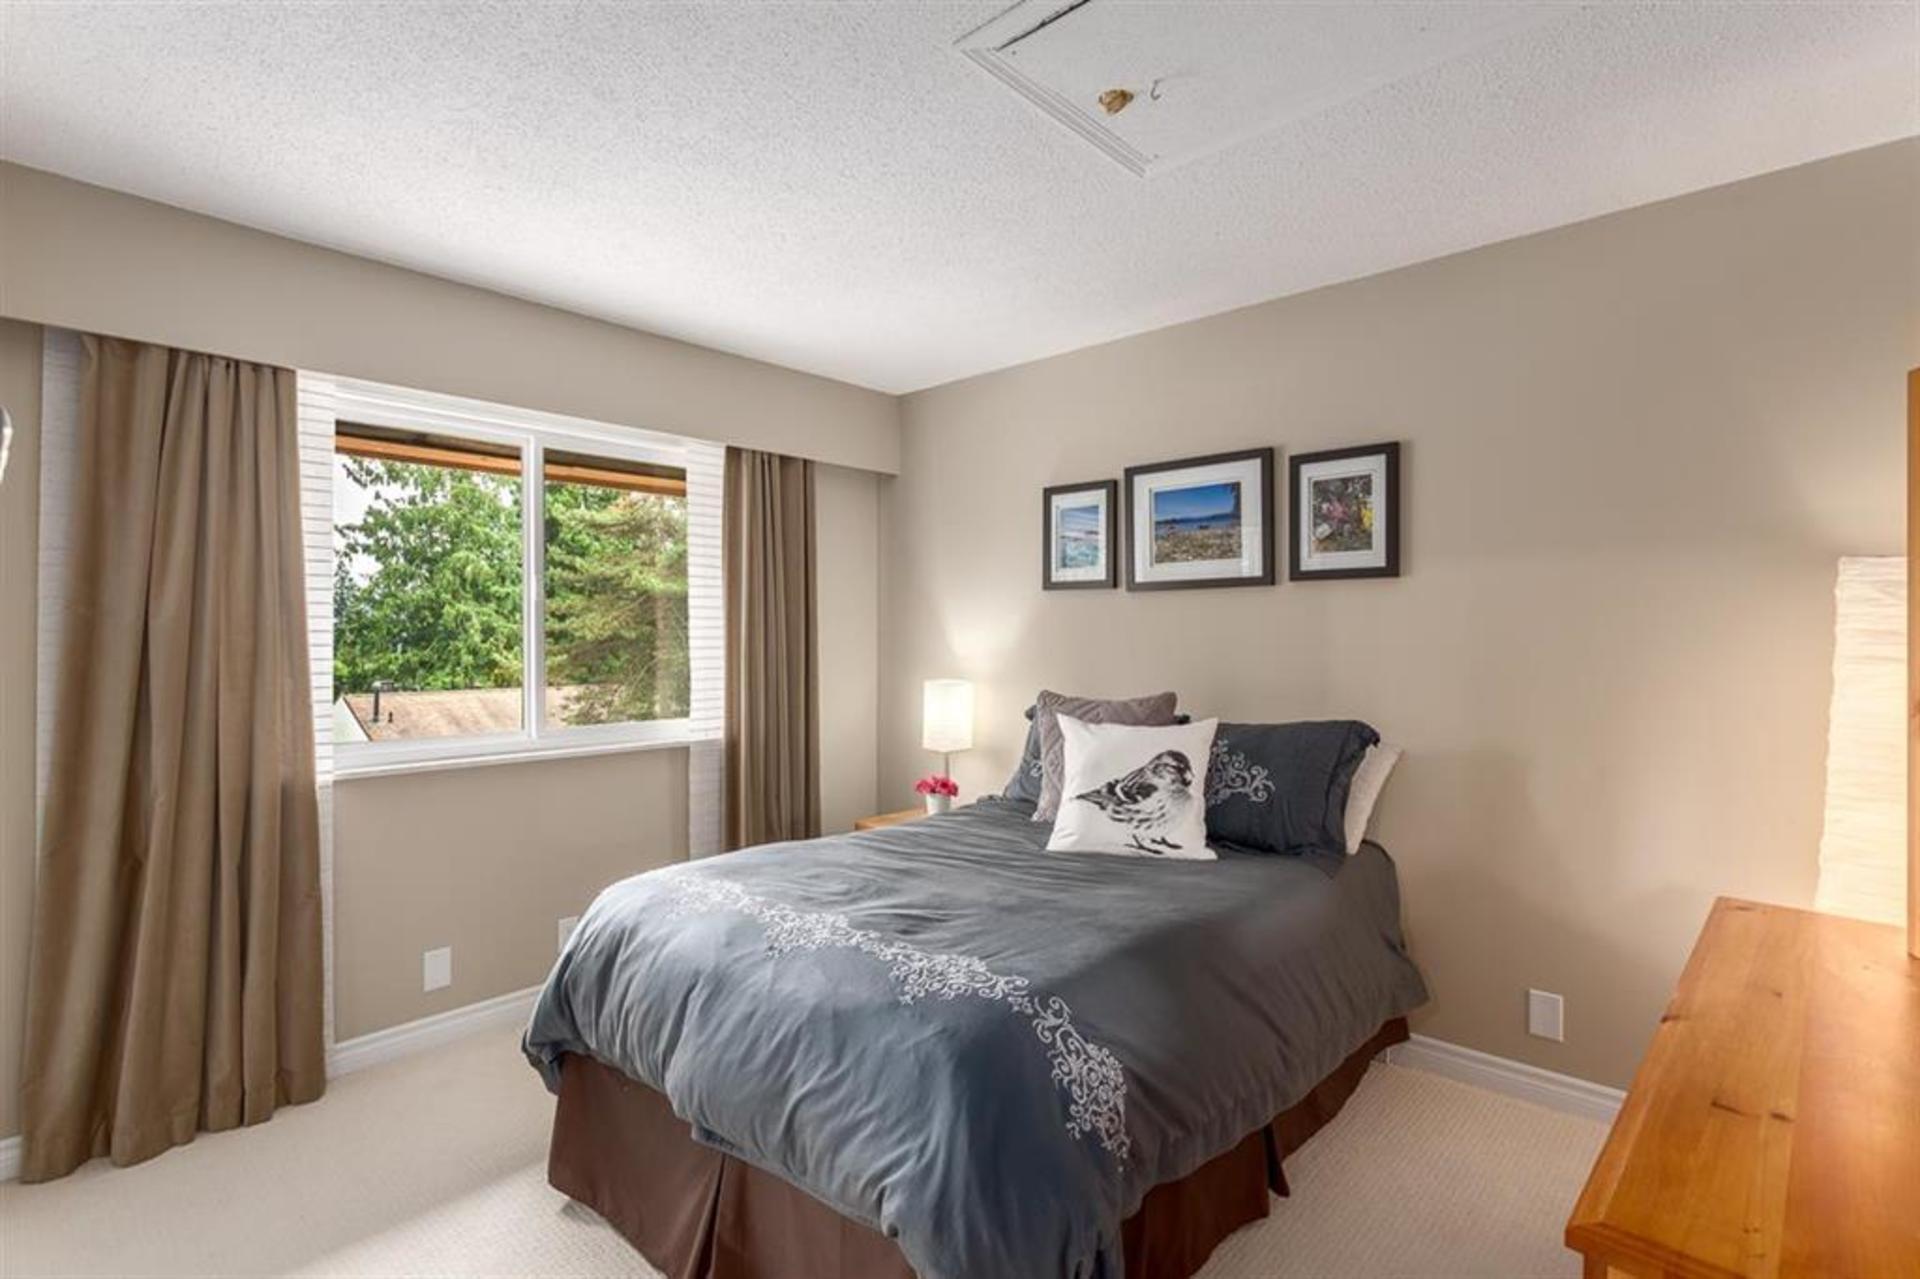 b23d359893fb659838c74661b538212e at 1542 Mcnair Drive, Lynn Valley, North Vancouver